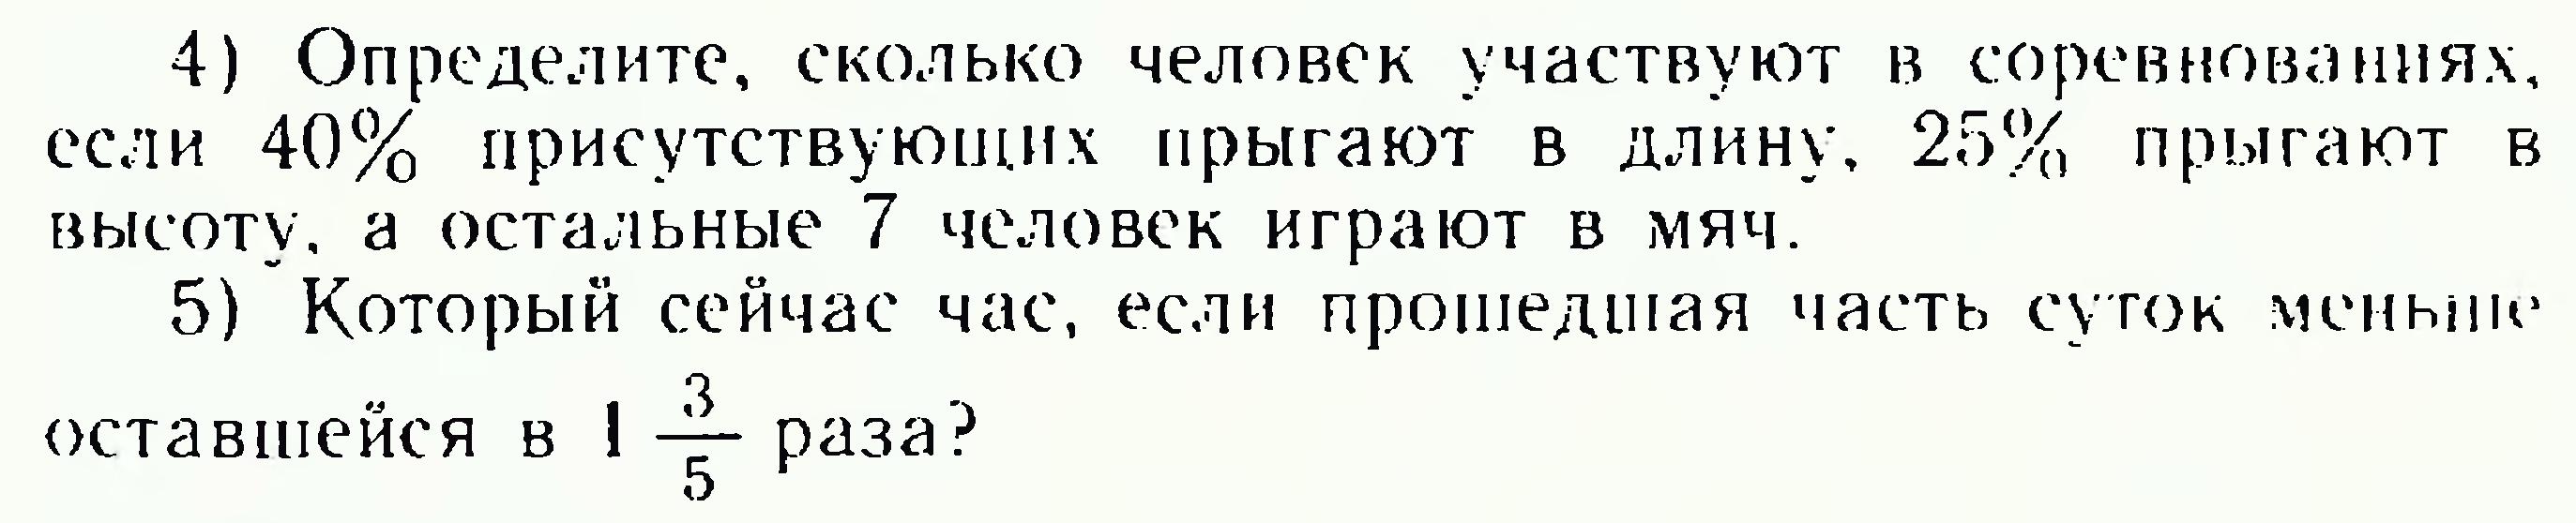 hello_html_23cd2714.png